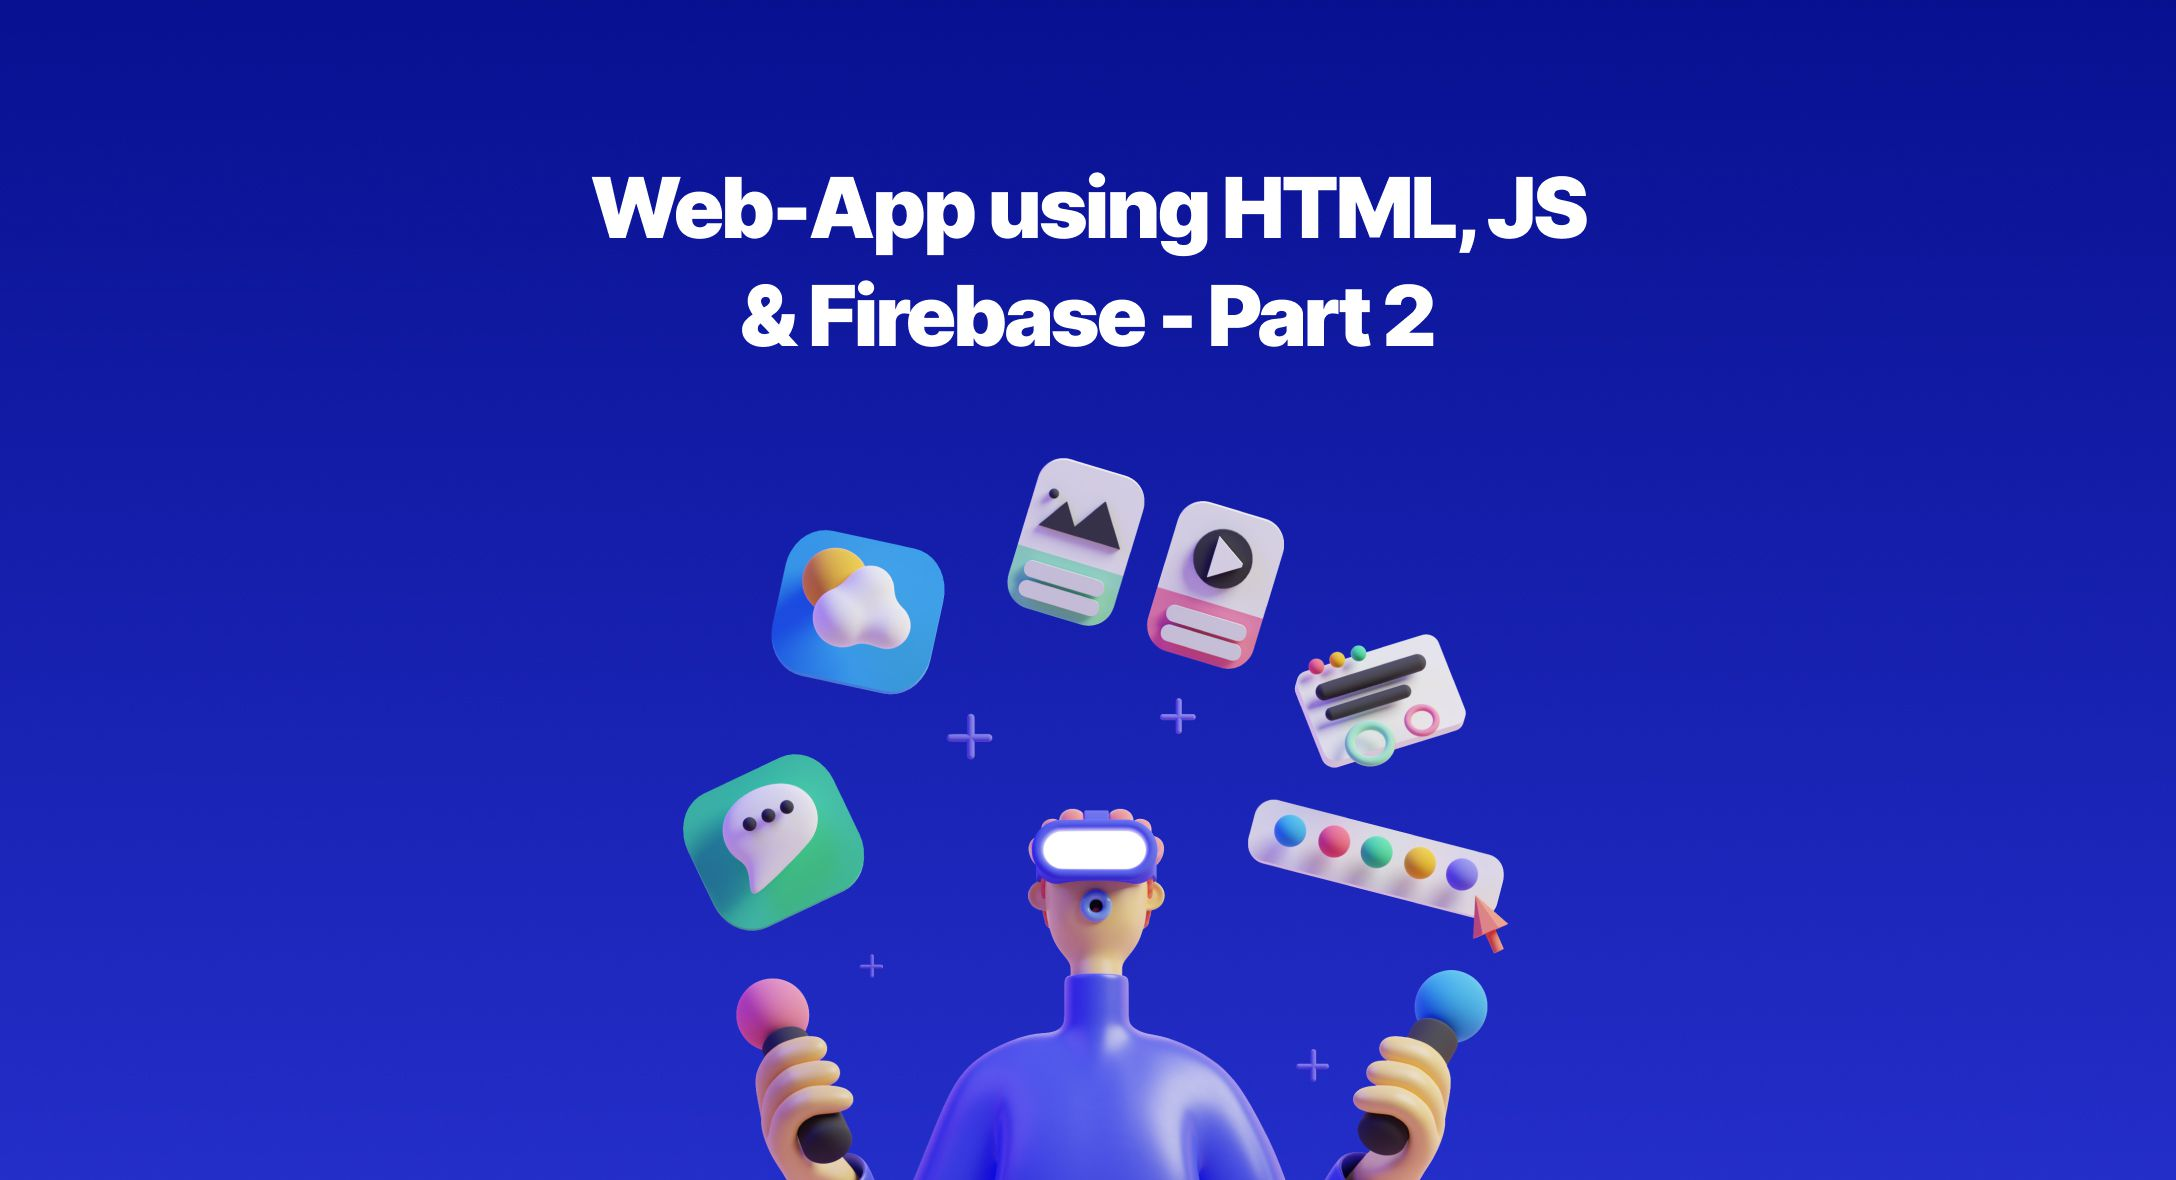 Web-App using HTML, JS & Firebase - Part 2